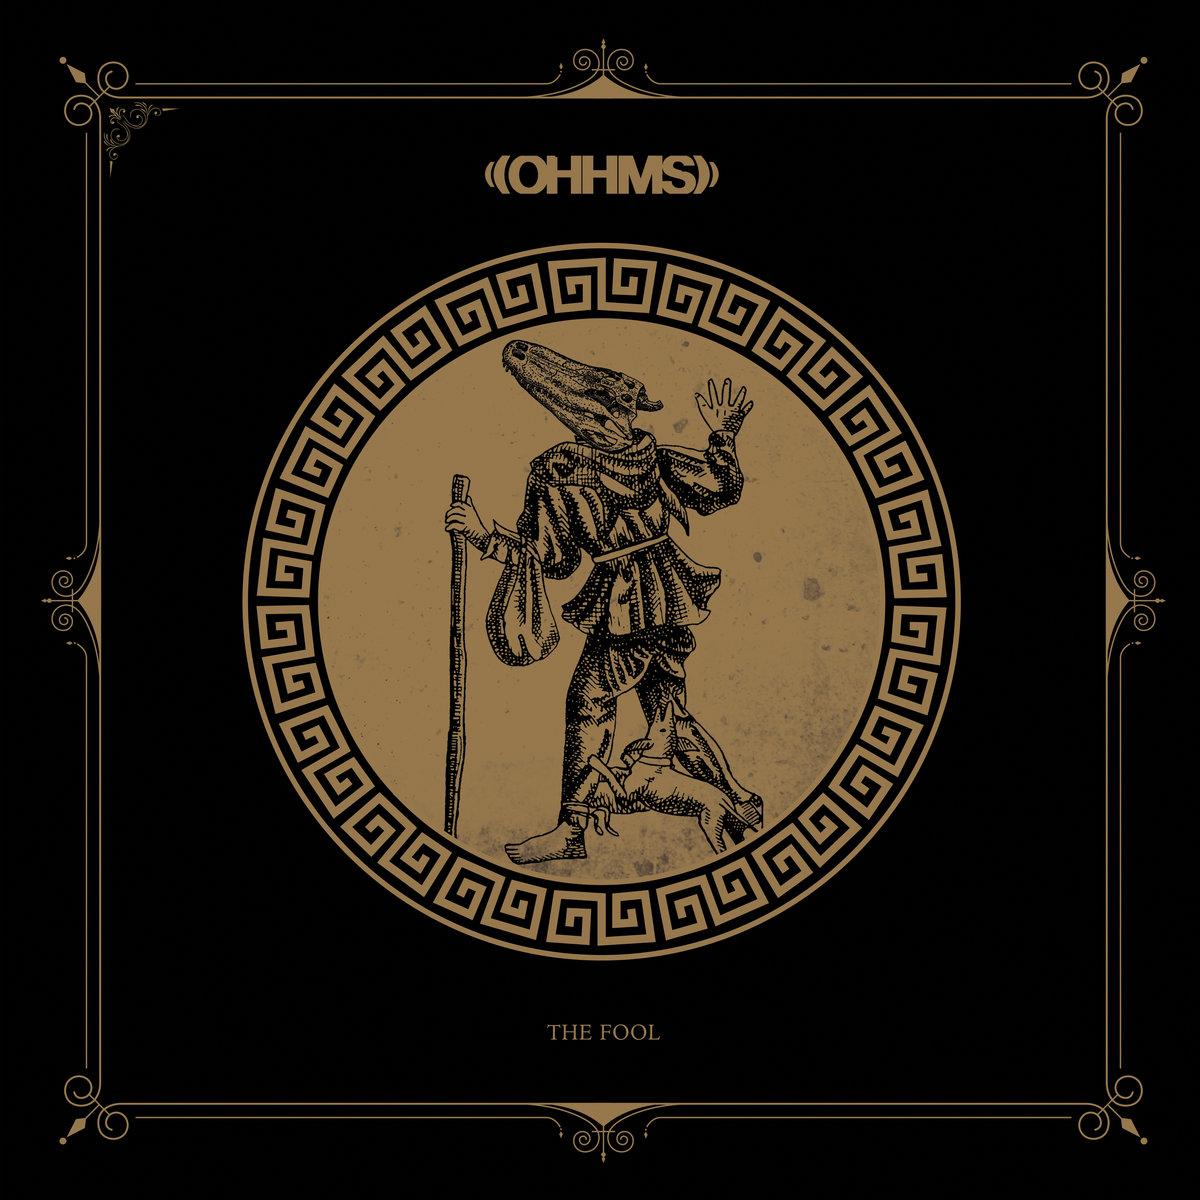 OHHMS - The Fool LP